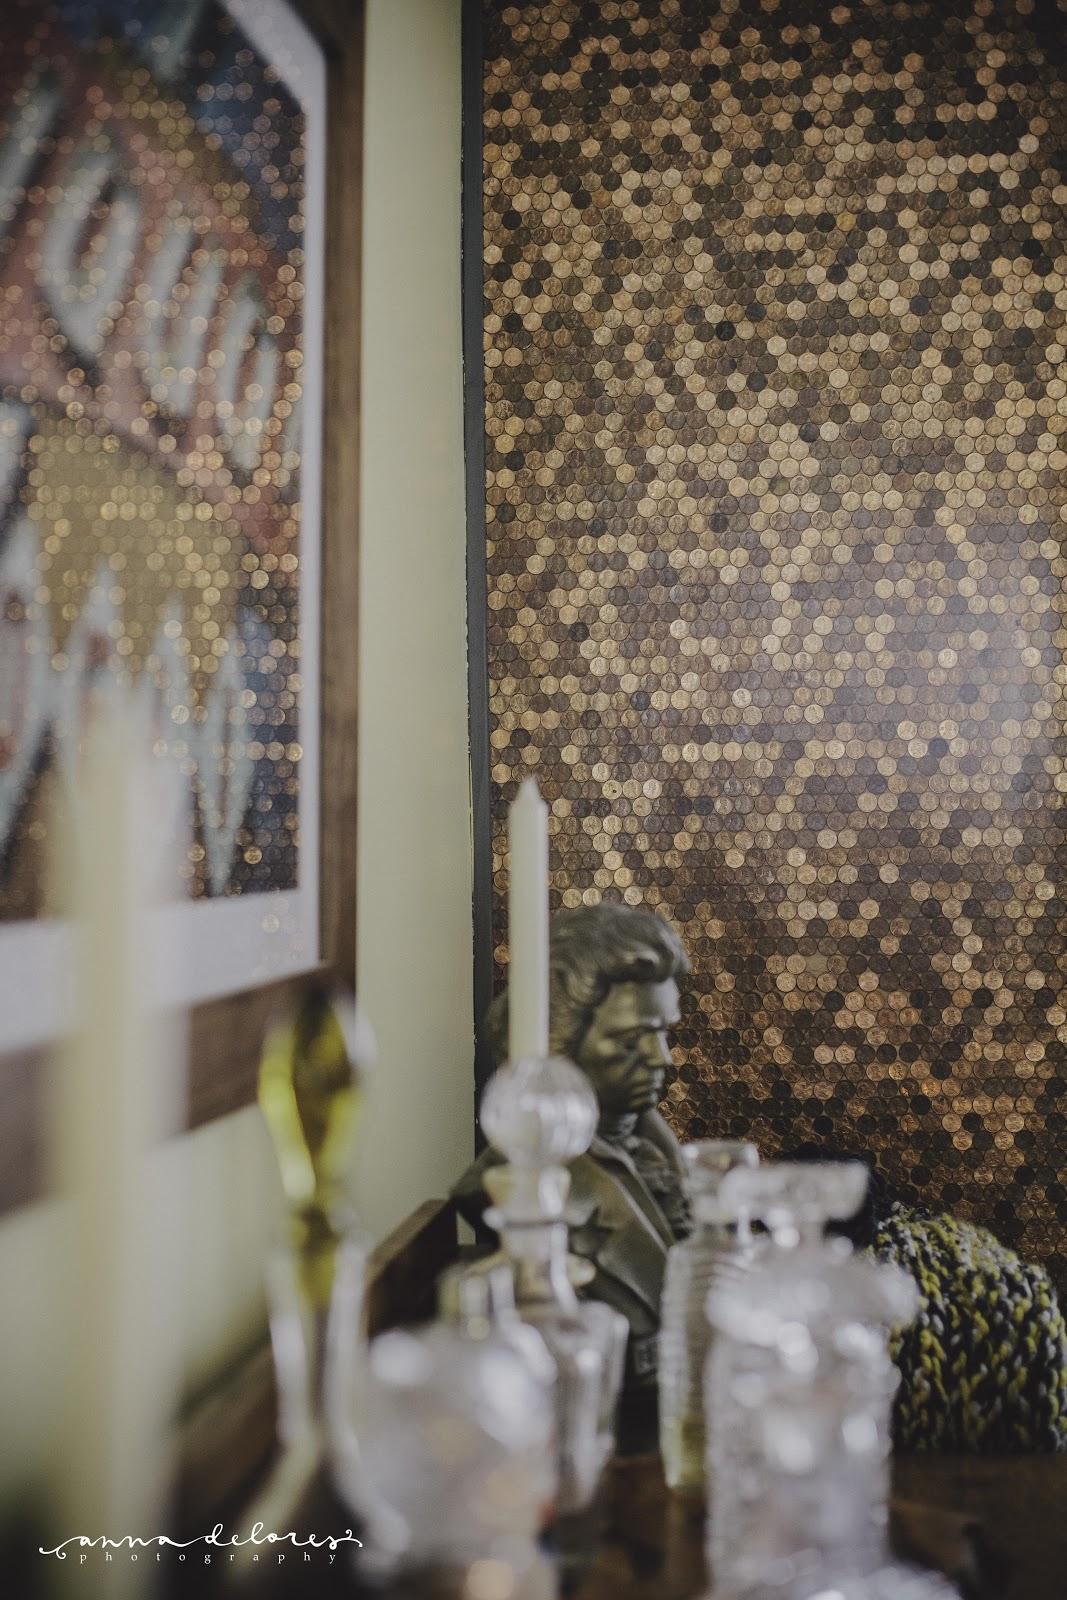 Home decor DIY for making an apartment a home - The Anna Delores Blog